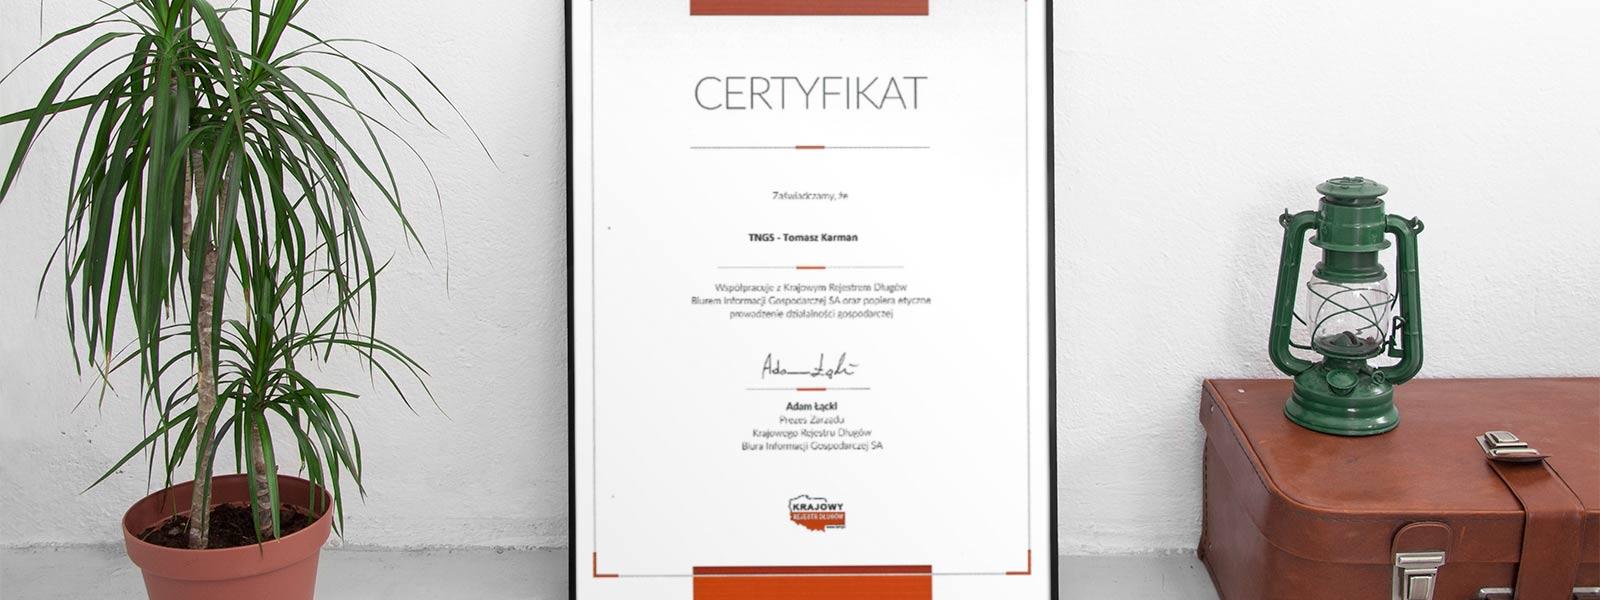 TNGS Tomasz Karman - Certyfikat KRD - TNGS Tomasz Karman - Biuro Obsługi Inwestora - Lublin